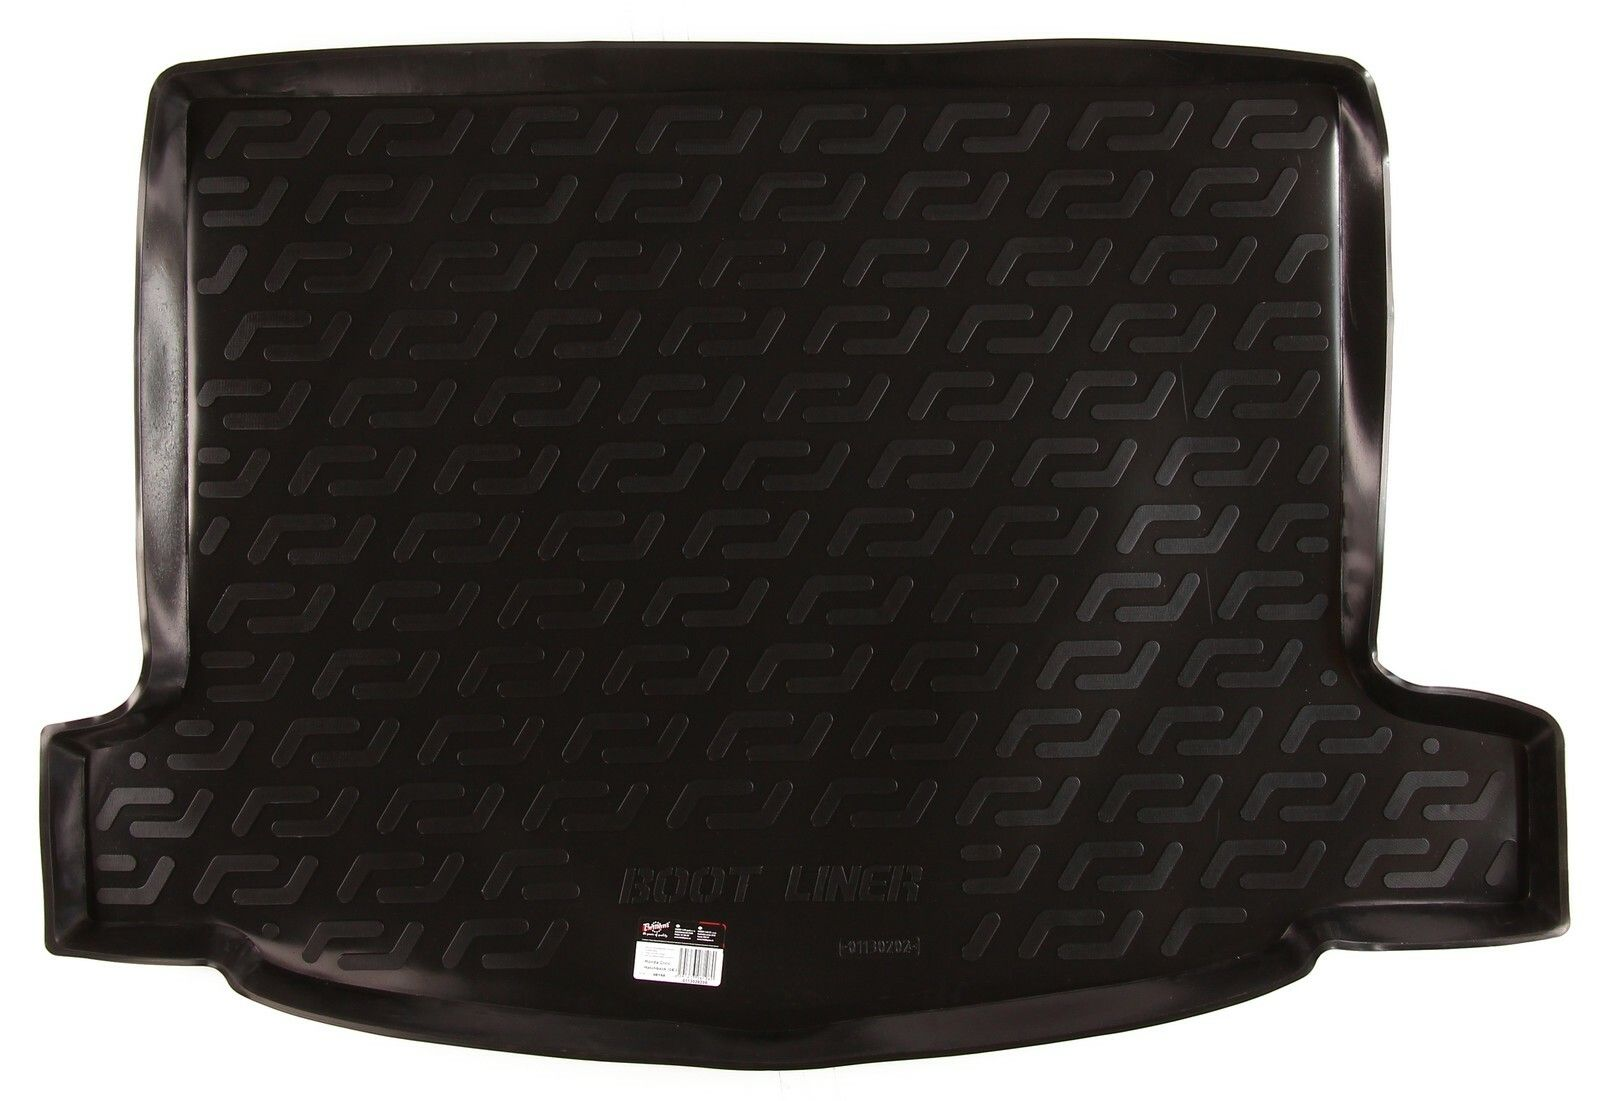 Vana do kufru plastová Honda Civic VIII Hatchback (FD1/2/7 FA1 FG1/2 FA5 FK FN) (06-11) SIXTOL